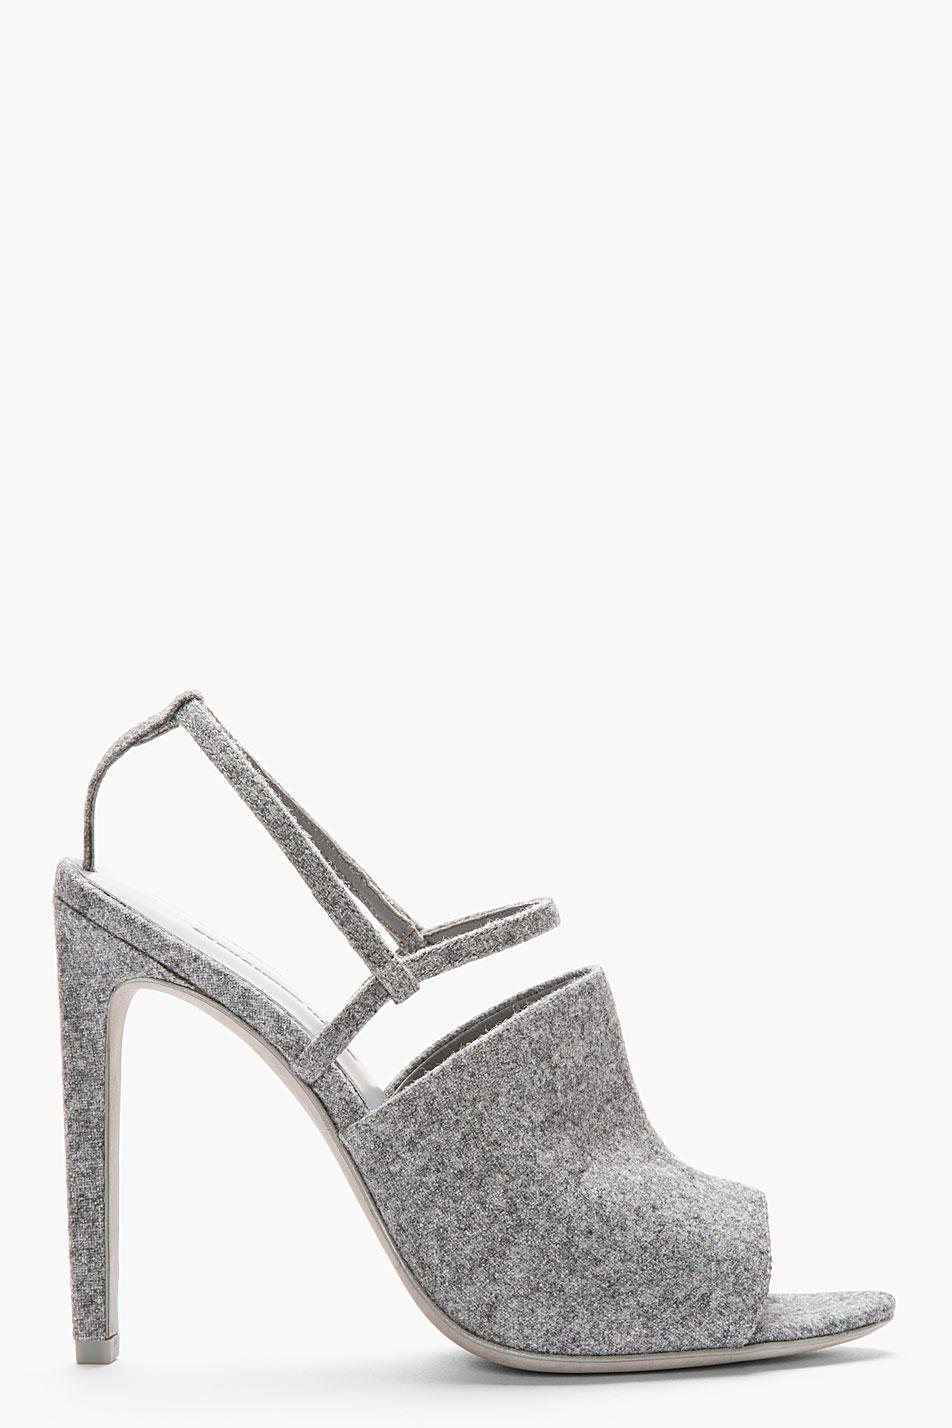 644d68136f90 Lyst - Alexander Wang Grey Wool Slingback Maryna Sandals in Gray